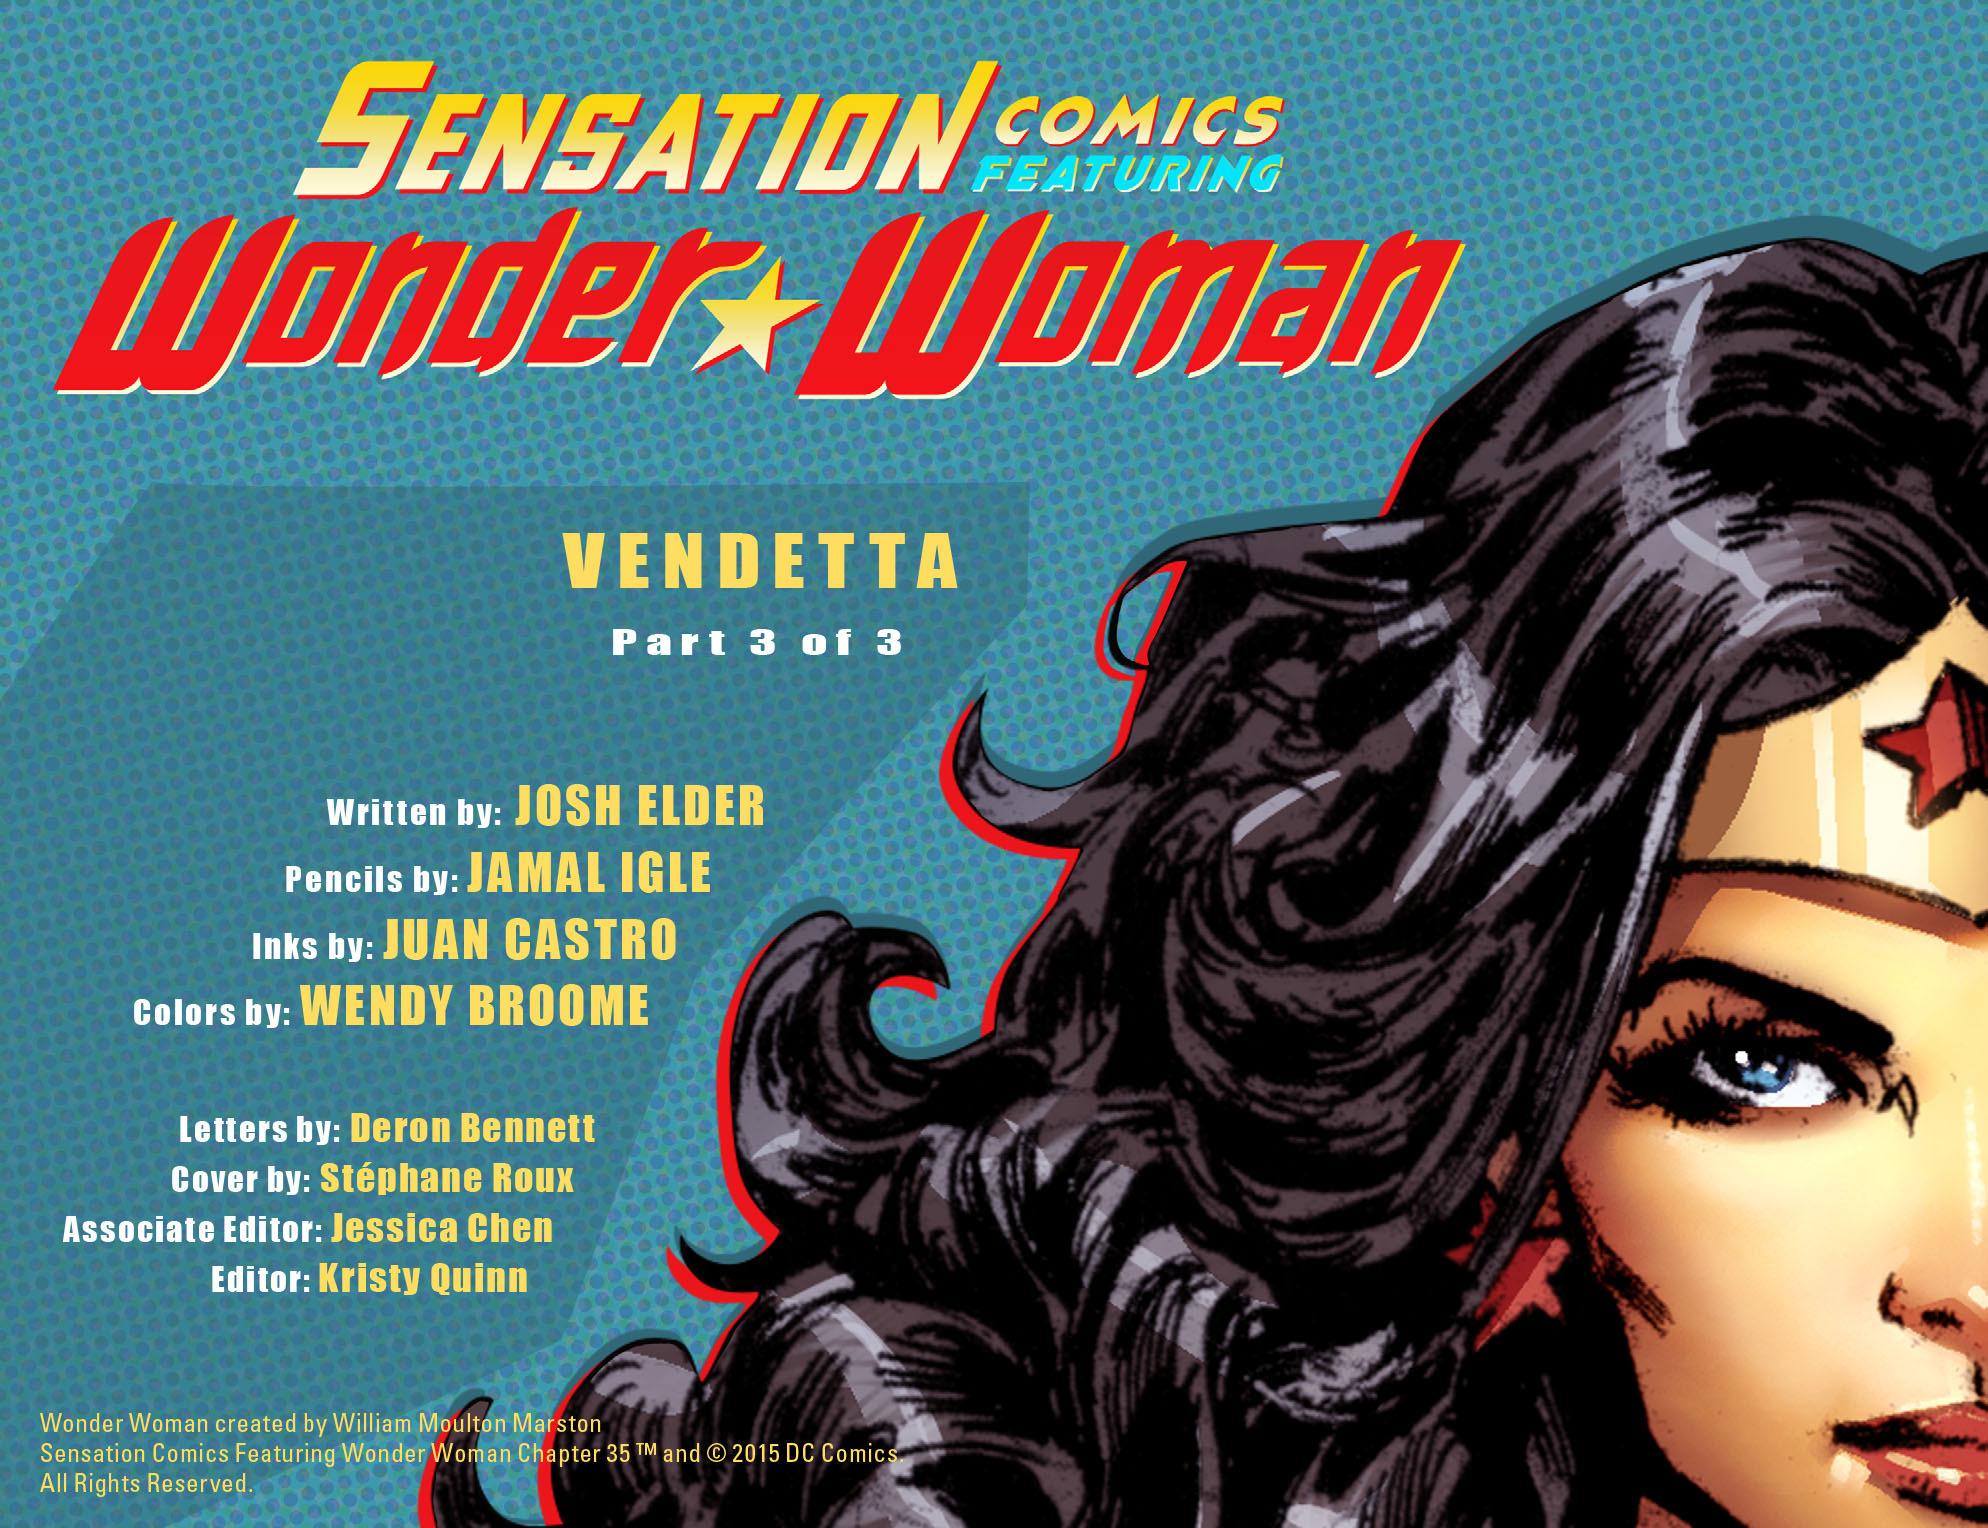 Read online Sensation Comics Featuring Wonder Woman comic -  Issue #35 - 2